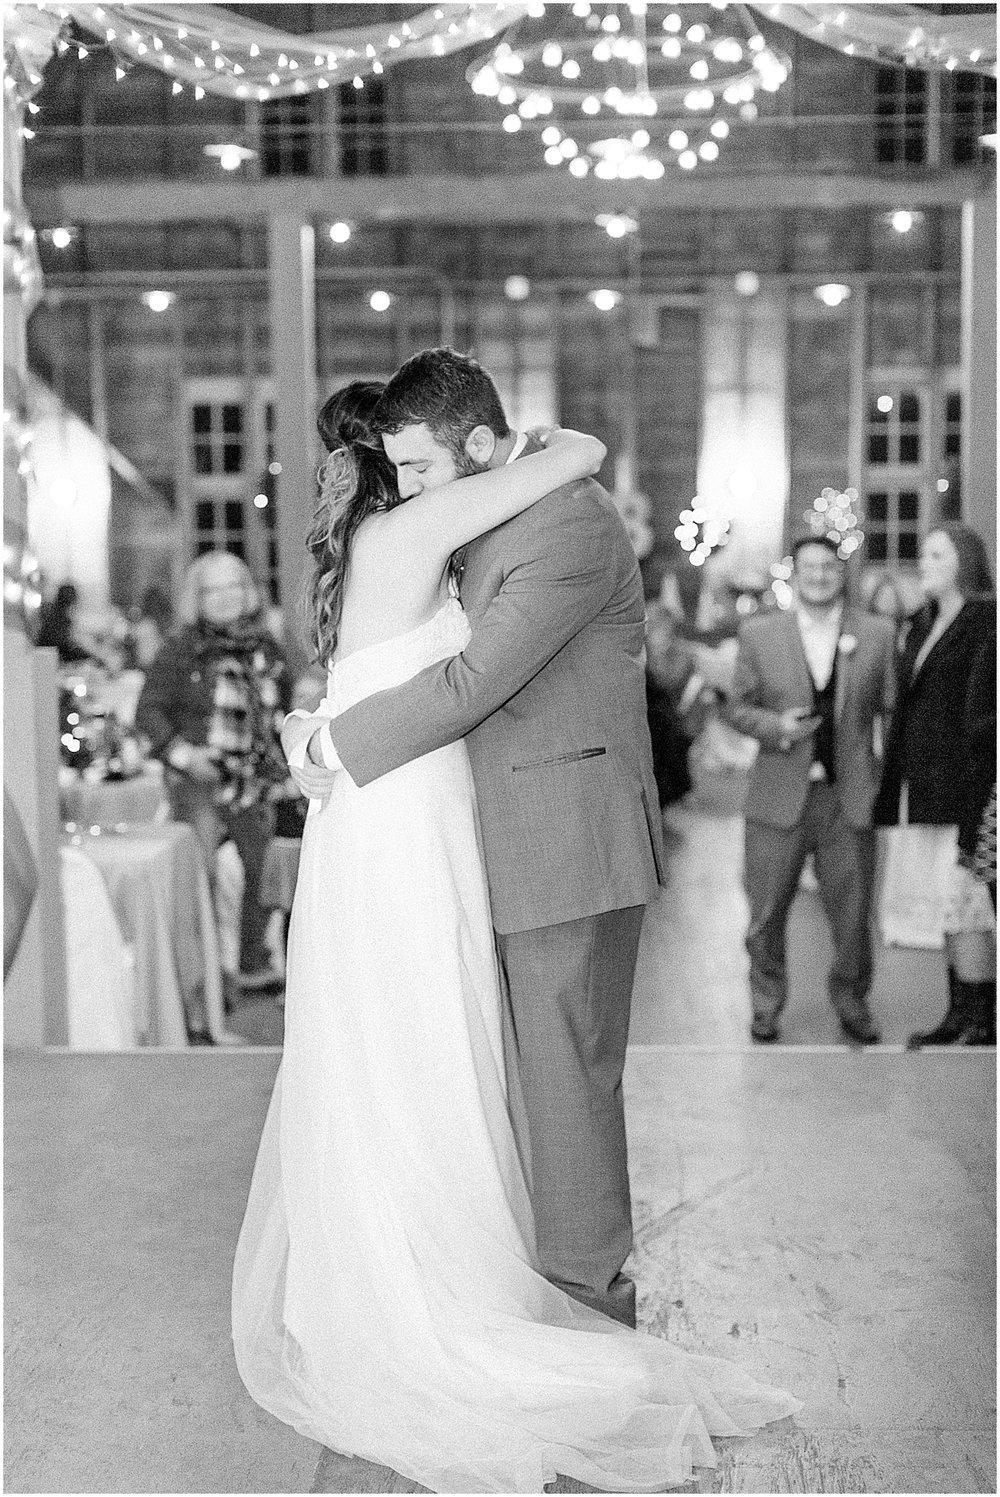 Chehalis Washington Winter Wedding Silver and White | Willapa Hills Farm Wedding | Eastham | Emma Rose Company PNW Light and Airy Wedding Photographer_0052.jpg